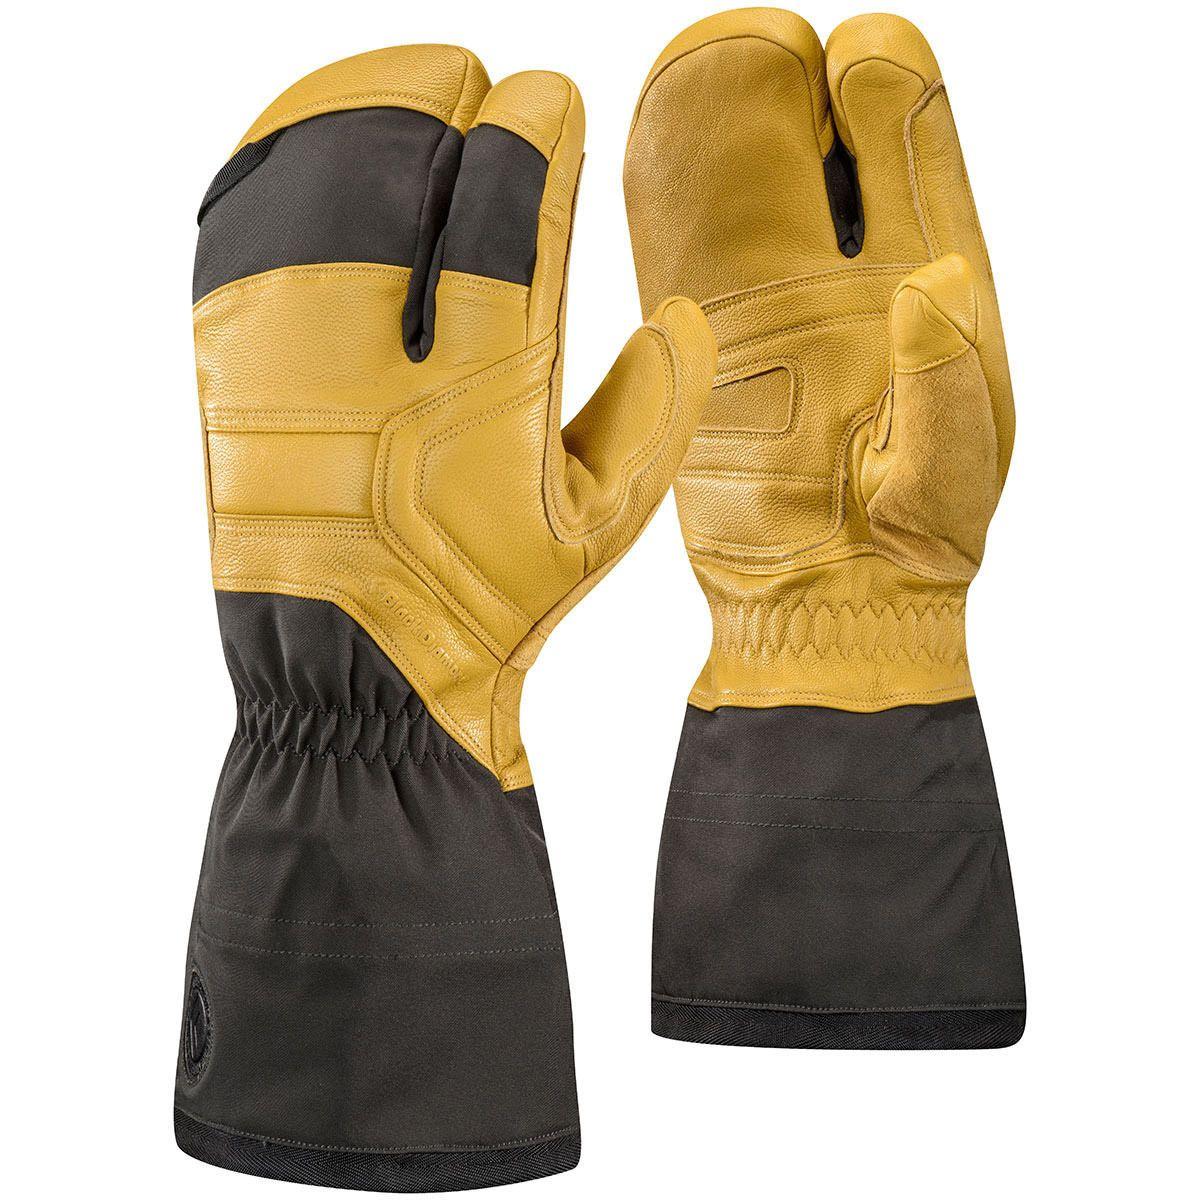 Mens gloves extra large - Gloves And Mittens 62172 New Black Diamond Guide Finger Mens Ski Snowboard Lobster Mitt